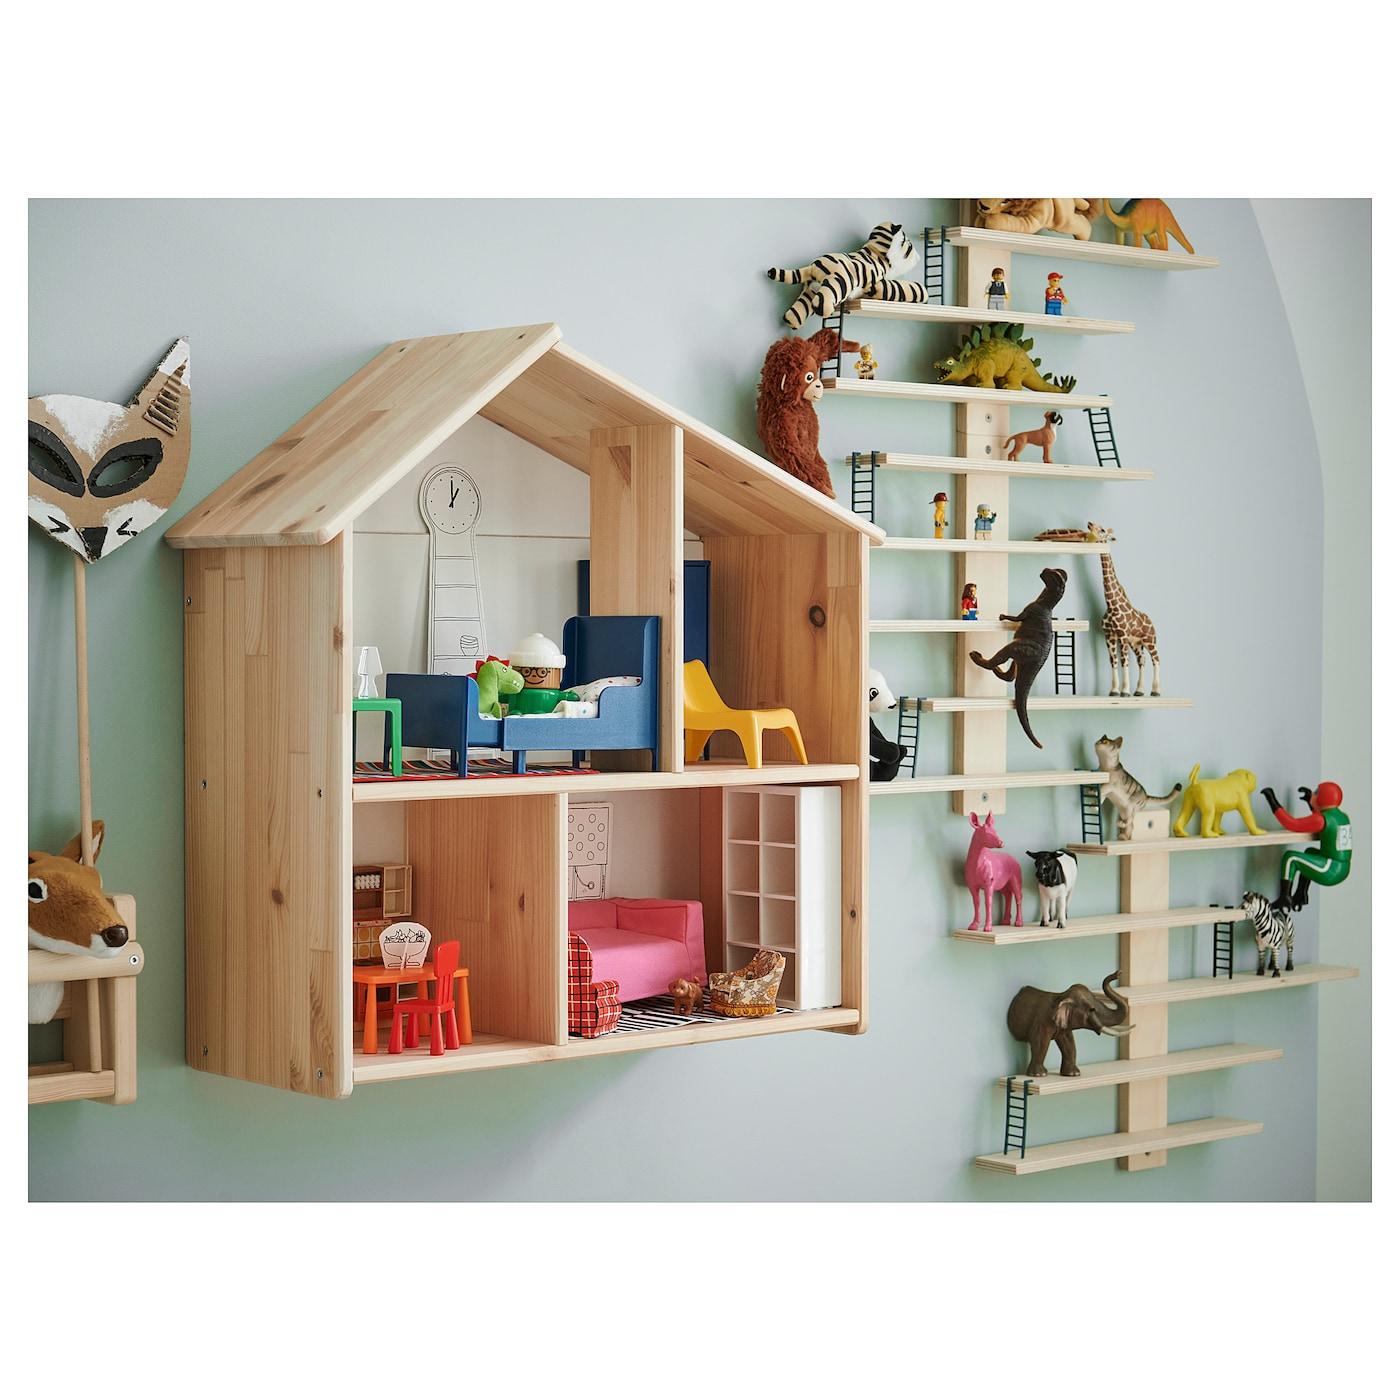 Mensole Legno Cucina Ikea flisat doll's house/wall shelf